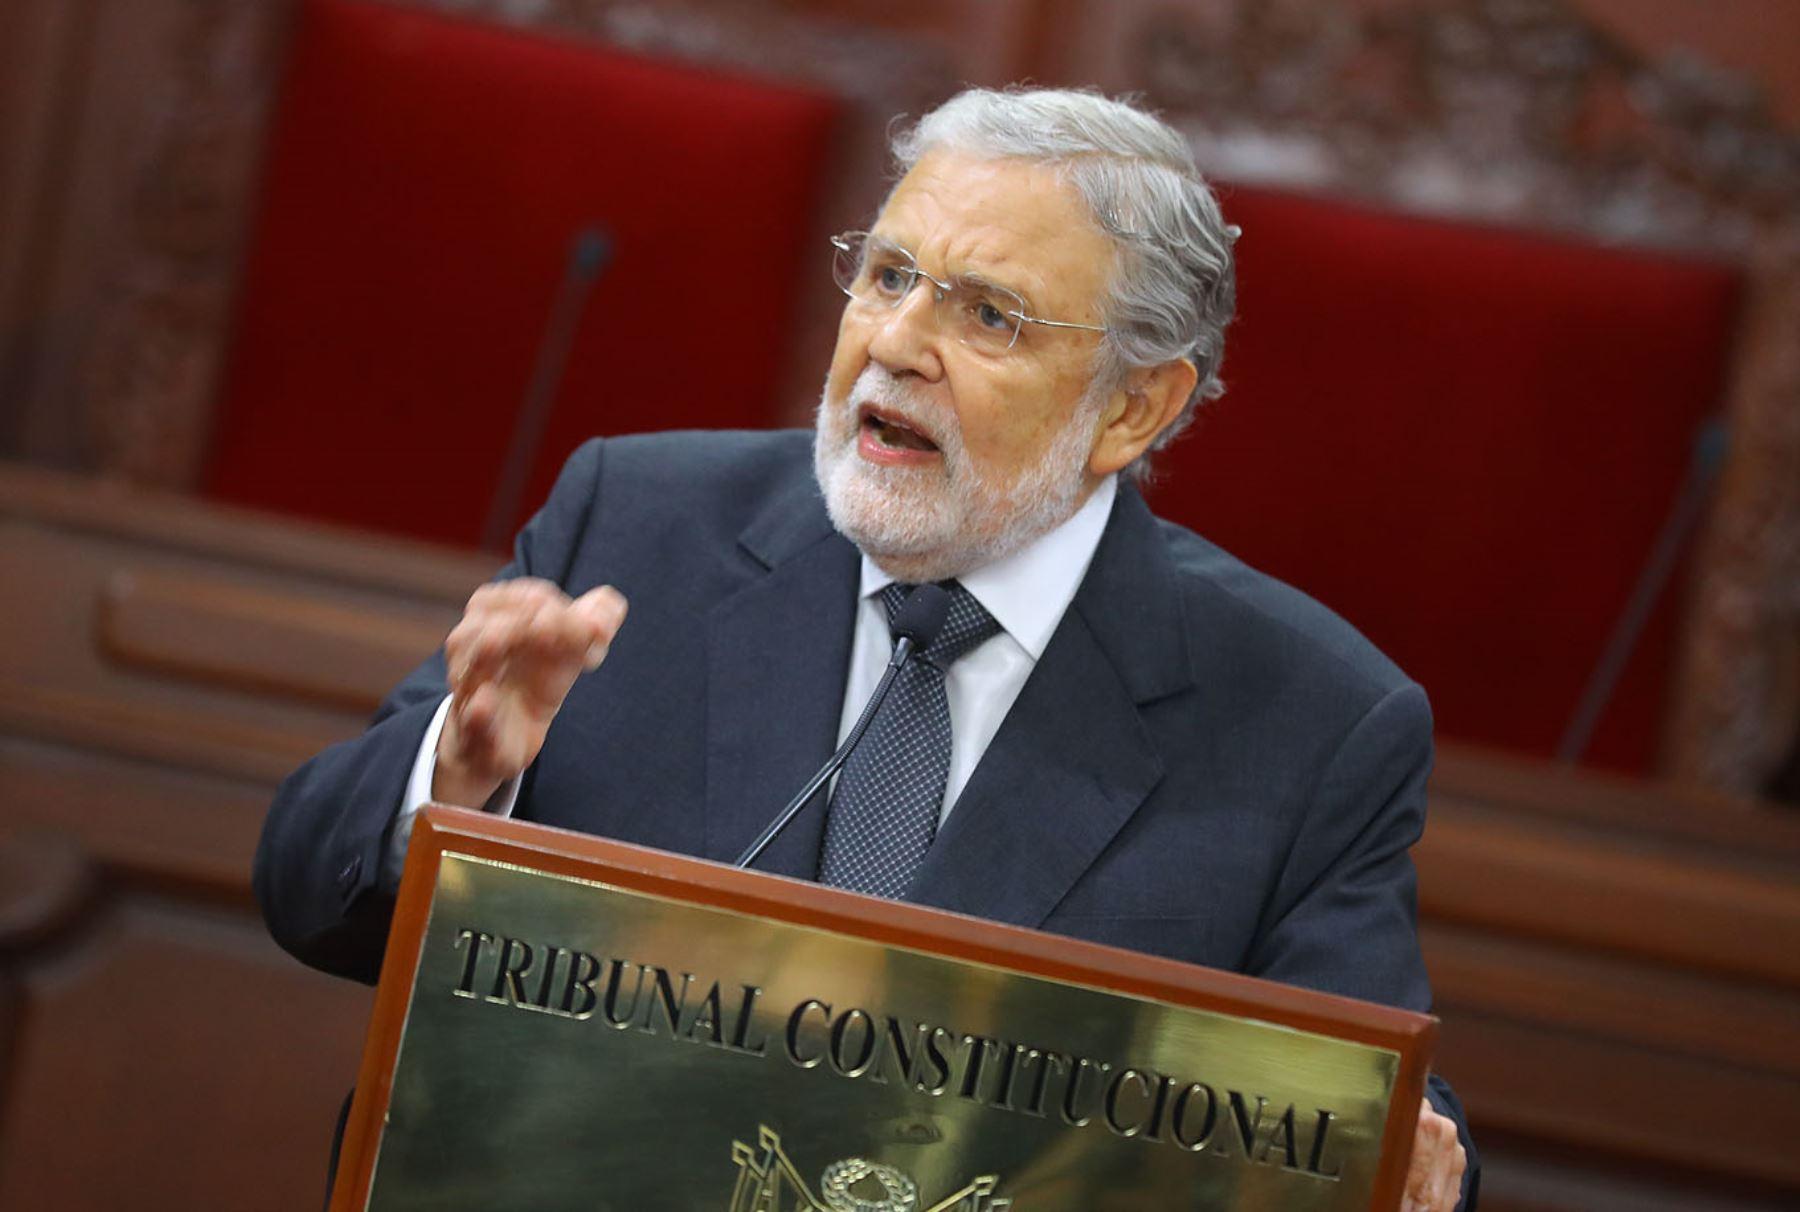 Presidente del Tribunal Constitucional, Ernesto Blume. Foto: ANDINA/Andrés Valle